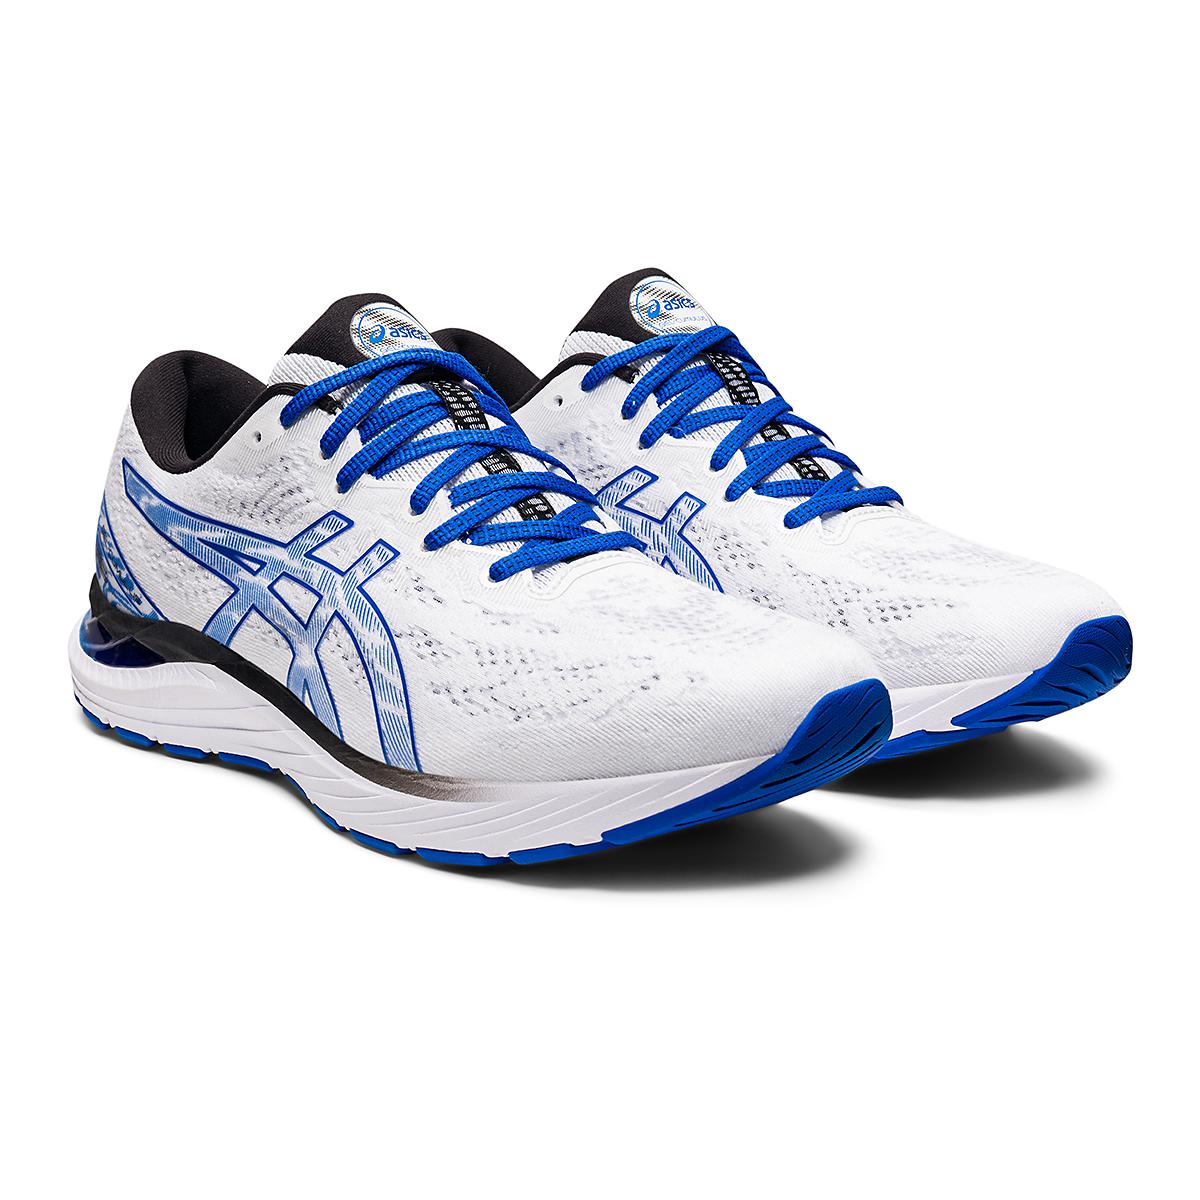 Men's Asics SMU Gel-Cumulus 23 Running Shoe - Color: White/Tuna Blue - Size: 6 - Width: Regular, White/Tuna Blue, large, image 3